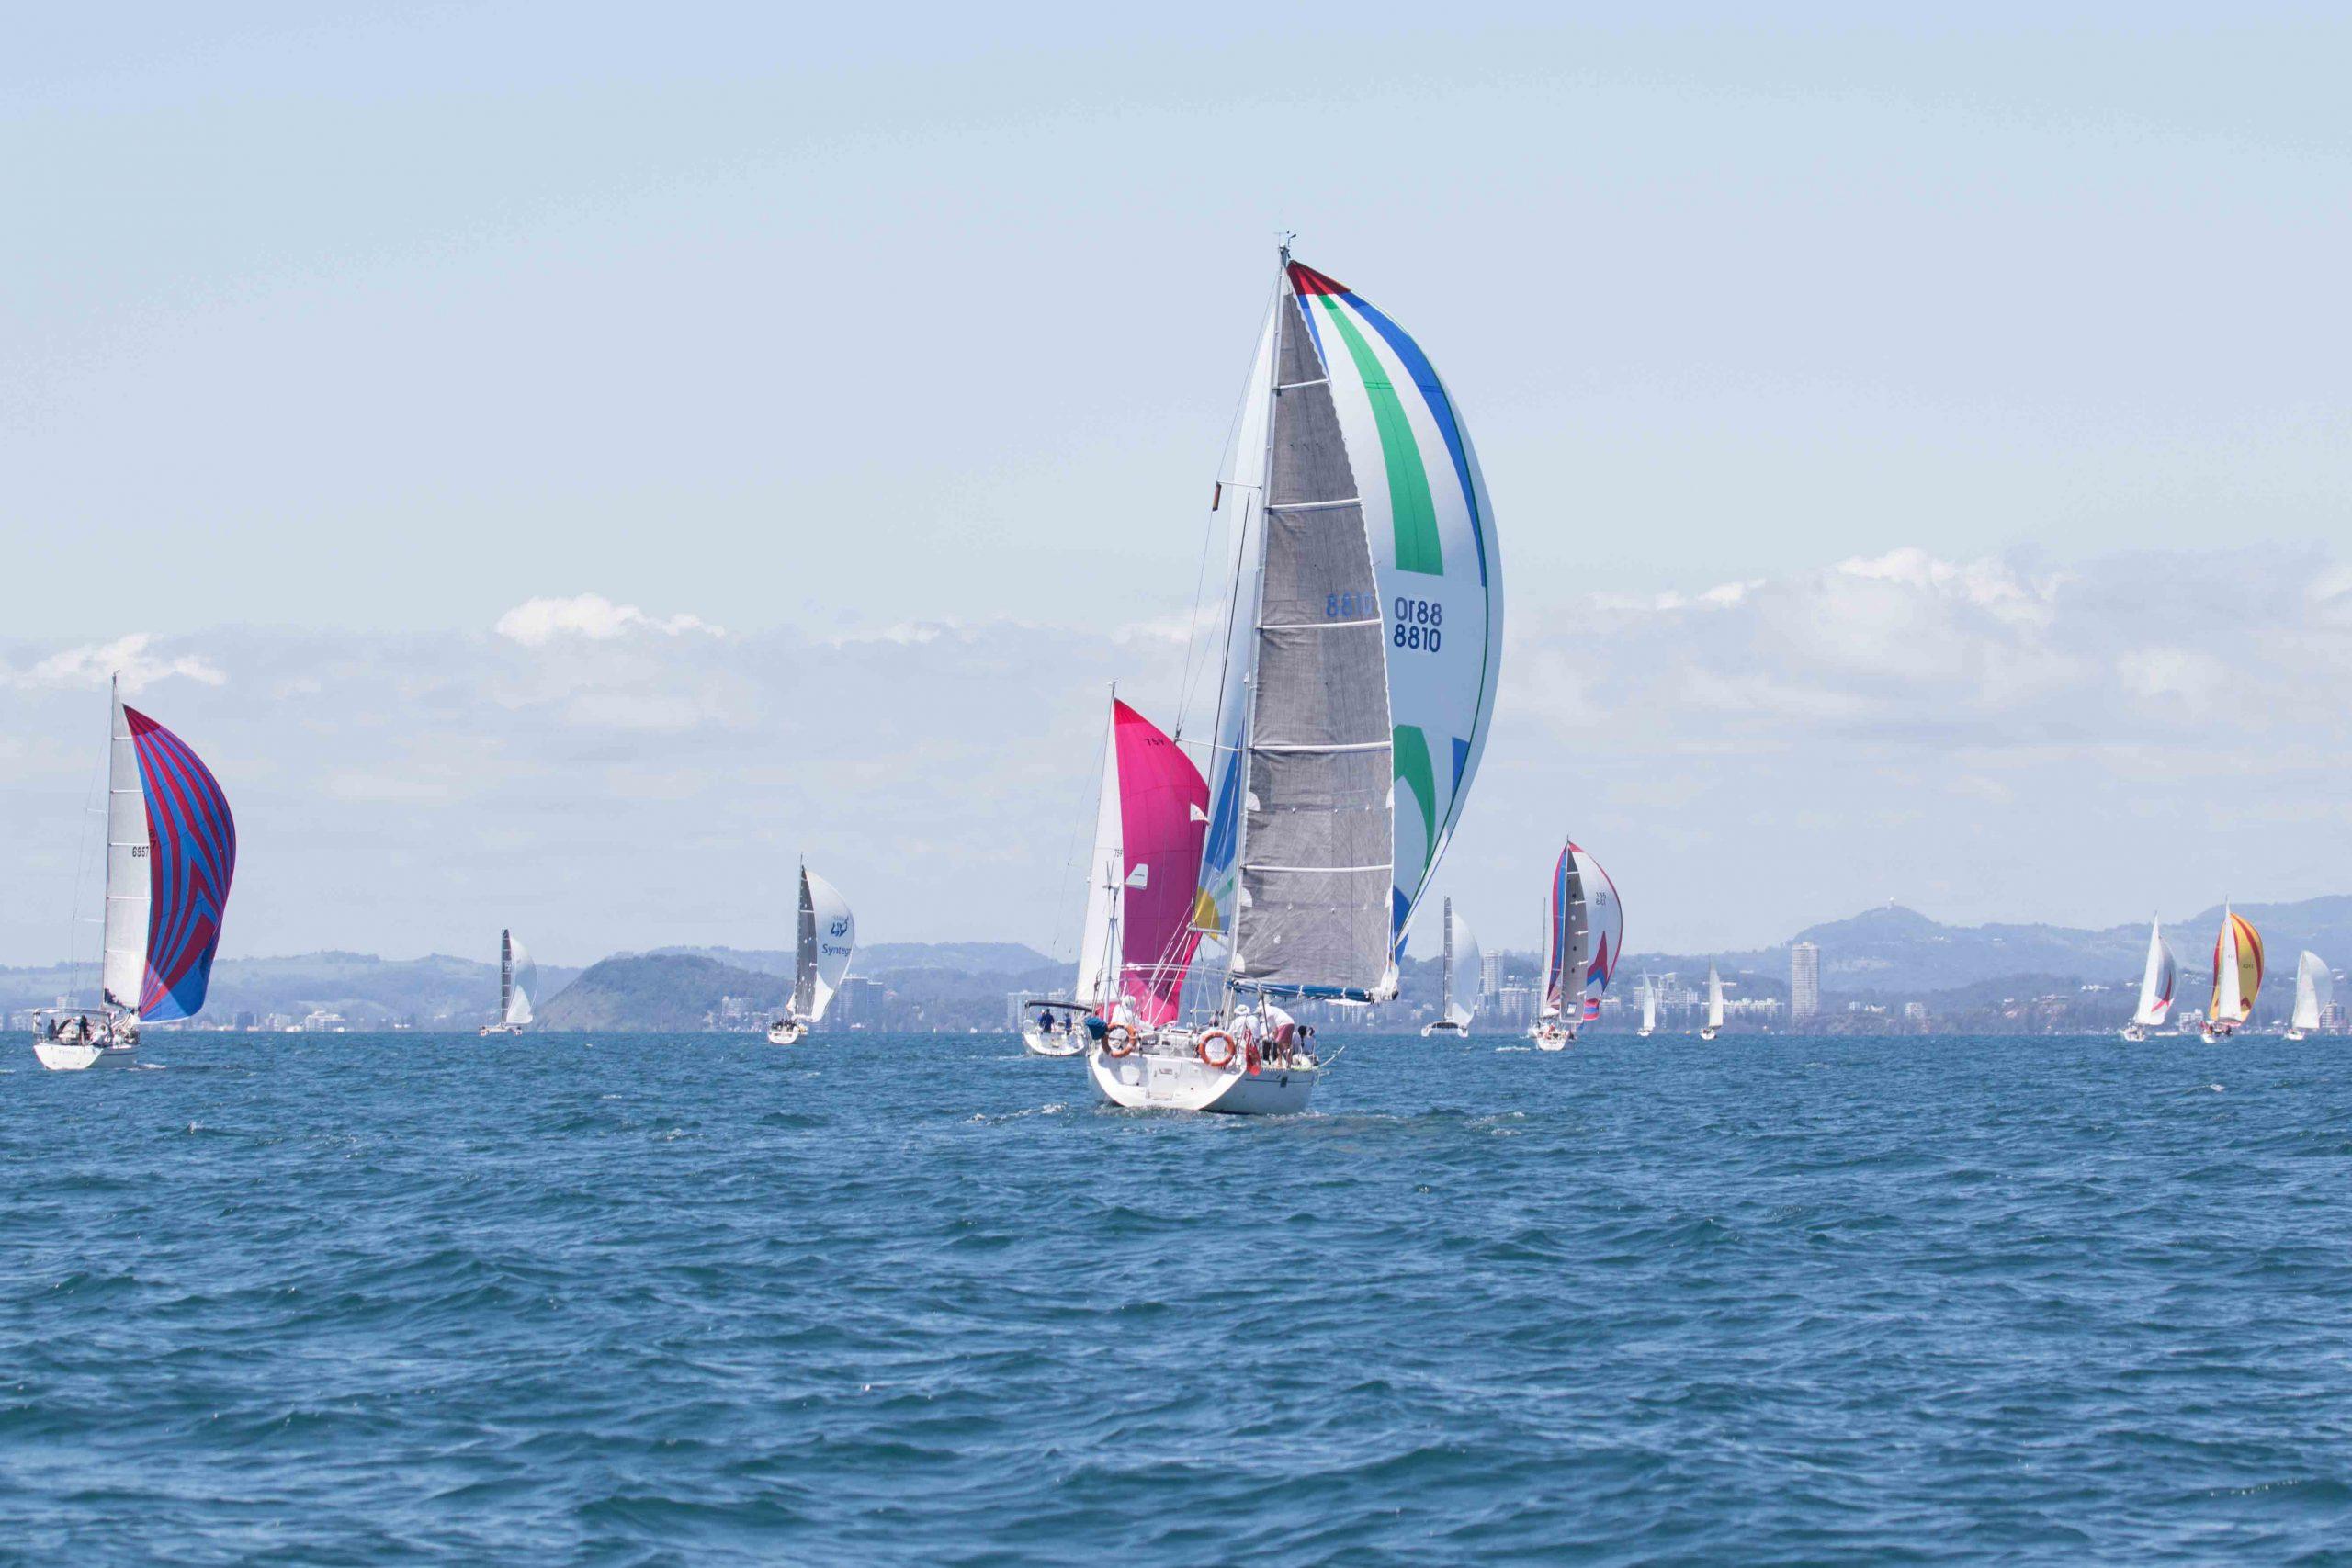 2016 Bartercard Sail Paradise fleet sailing on the beautiful waters of the Gold Coast